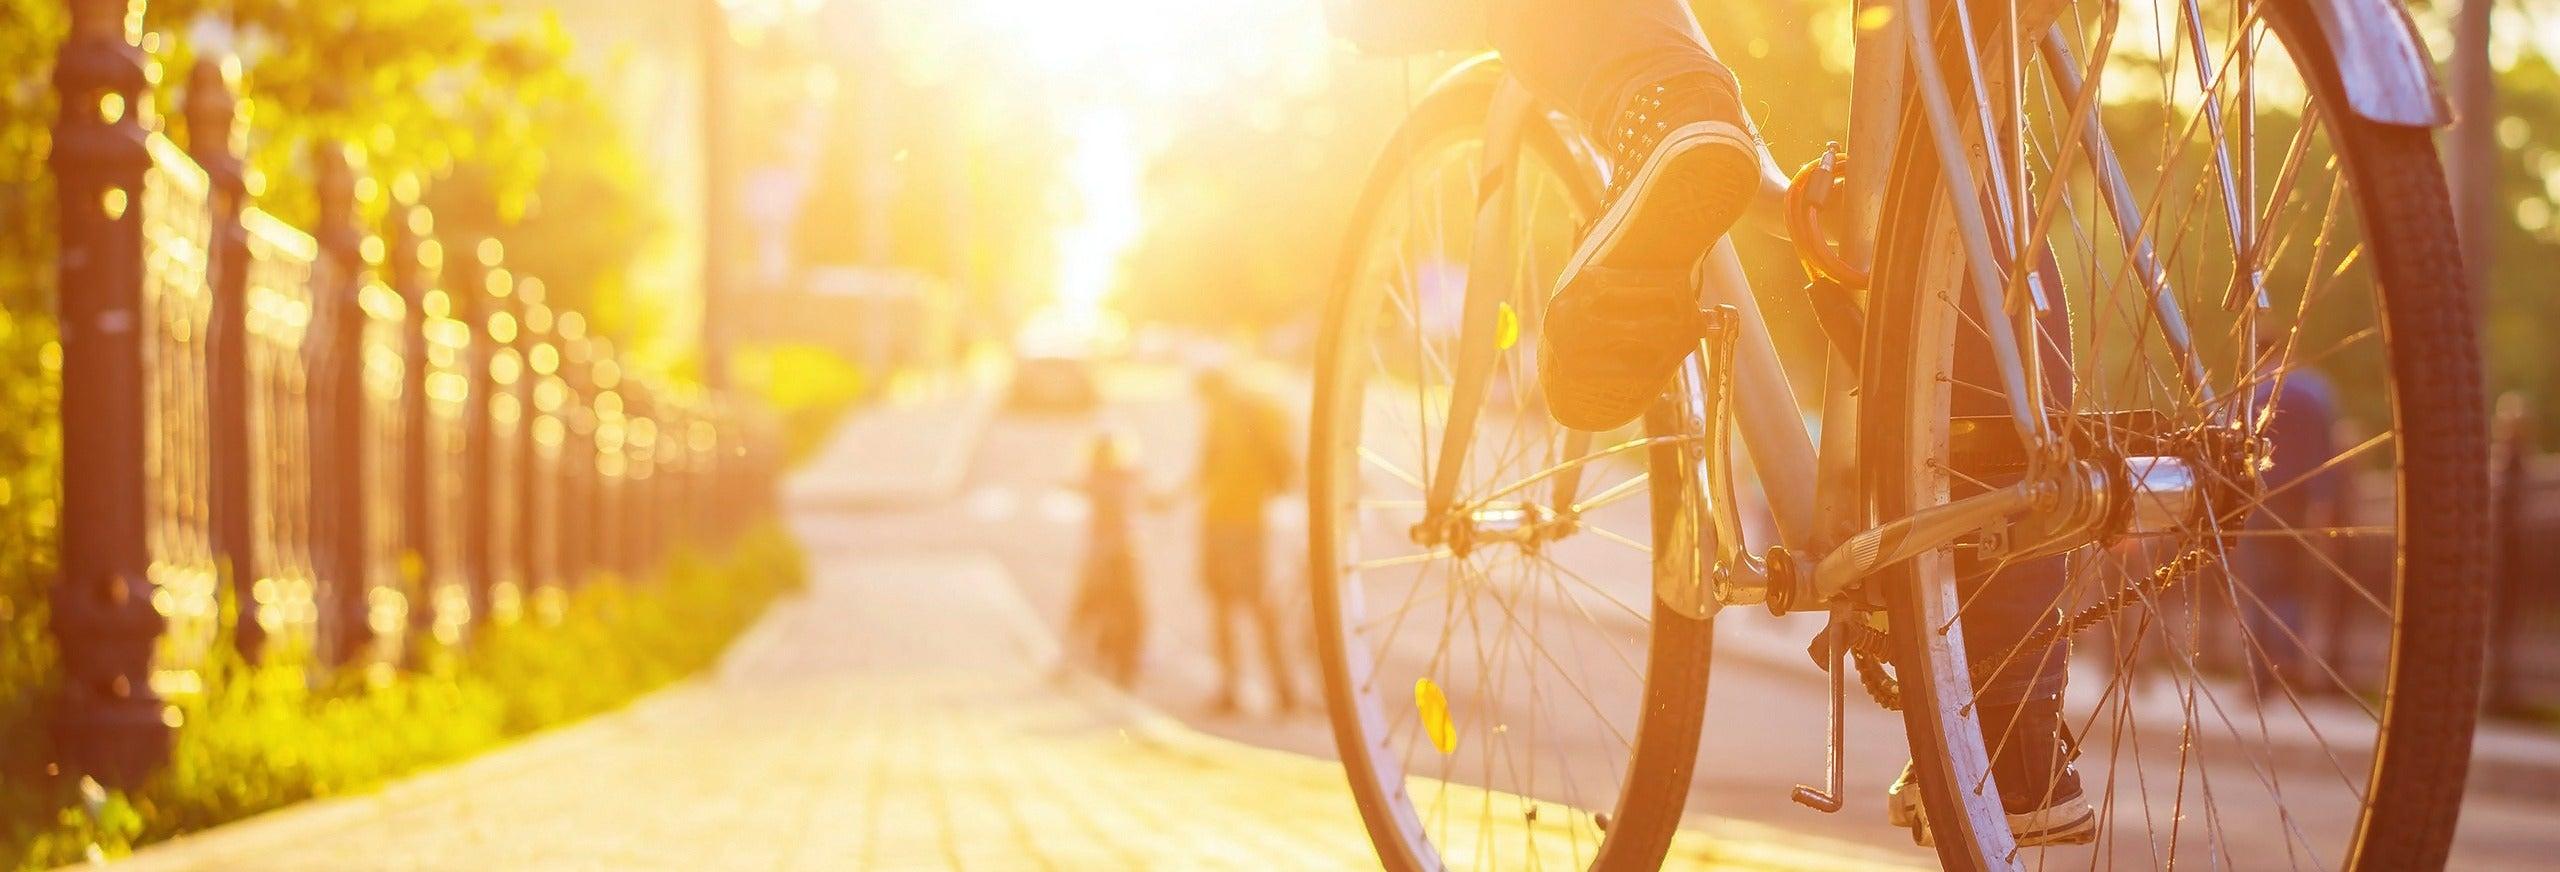 Tour de bicicleta por Valladolid